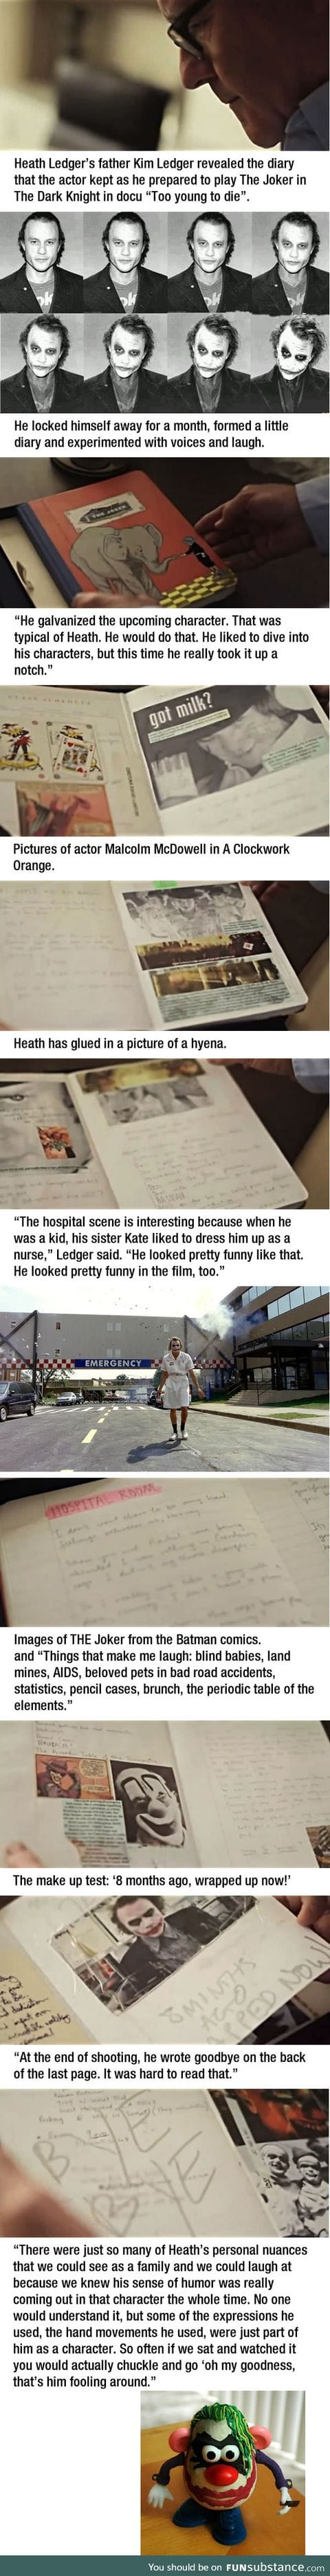 Heath Ledger was an interesting man